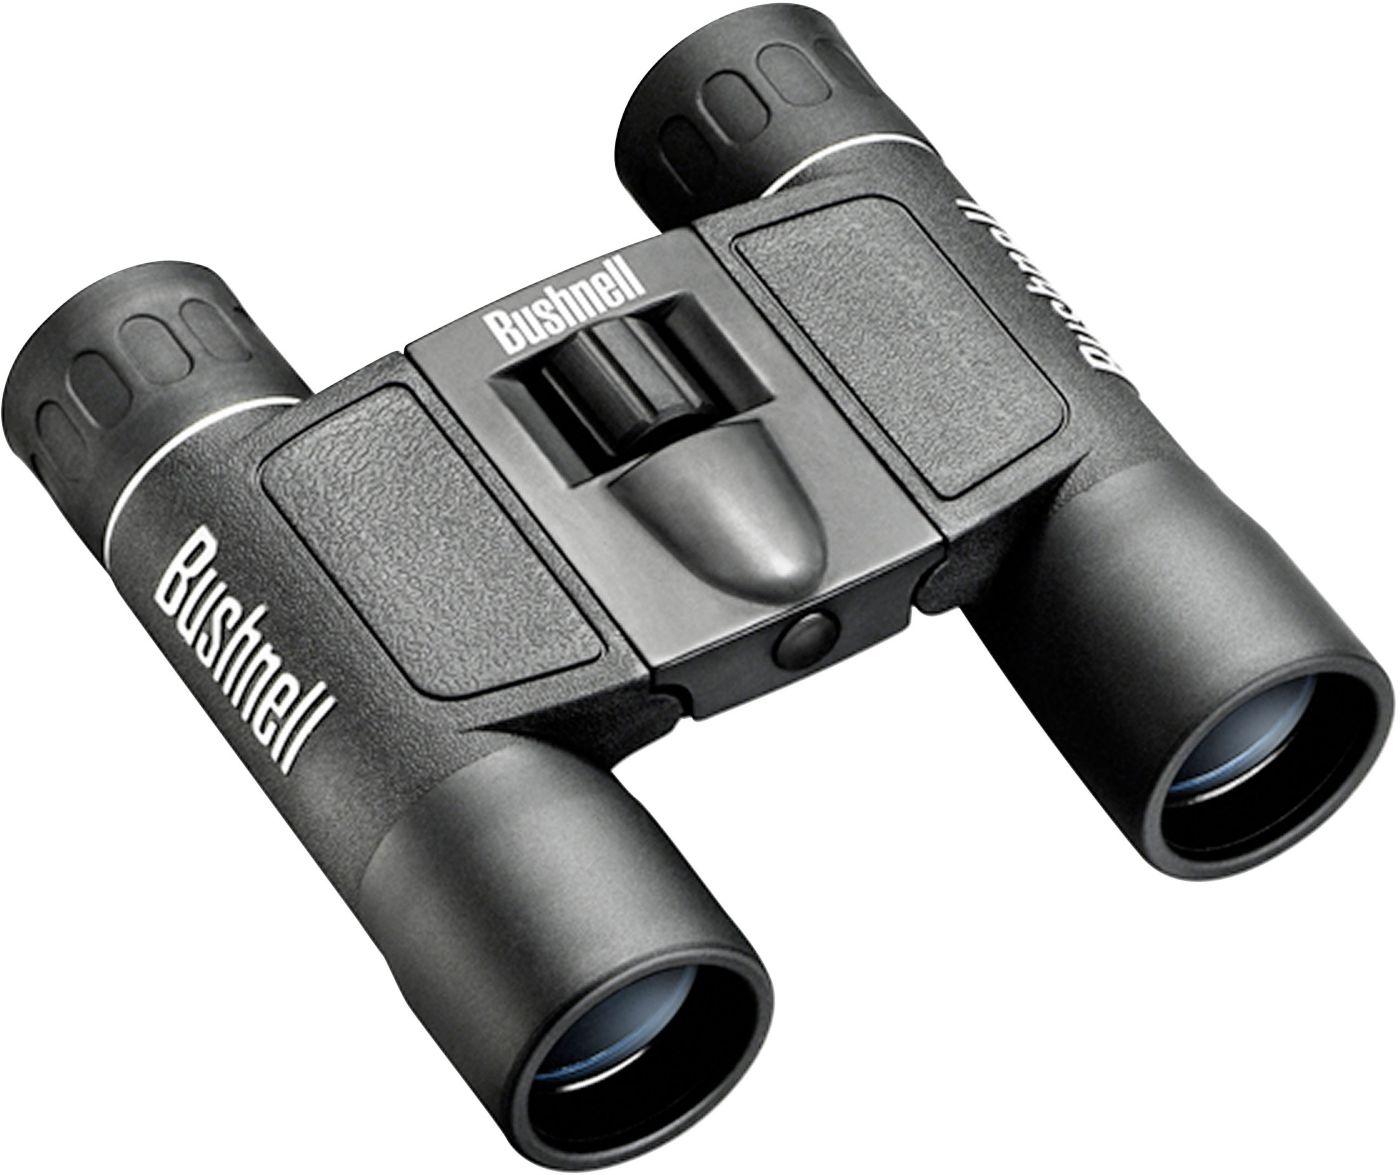 Bushnell Powerview 10x25 Roof Prism Binoculars